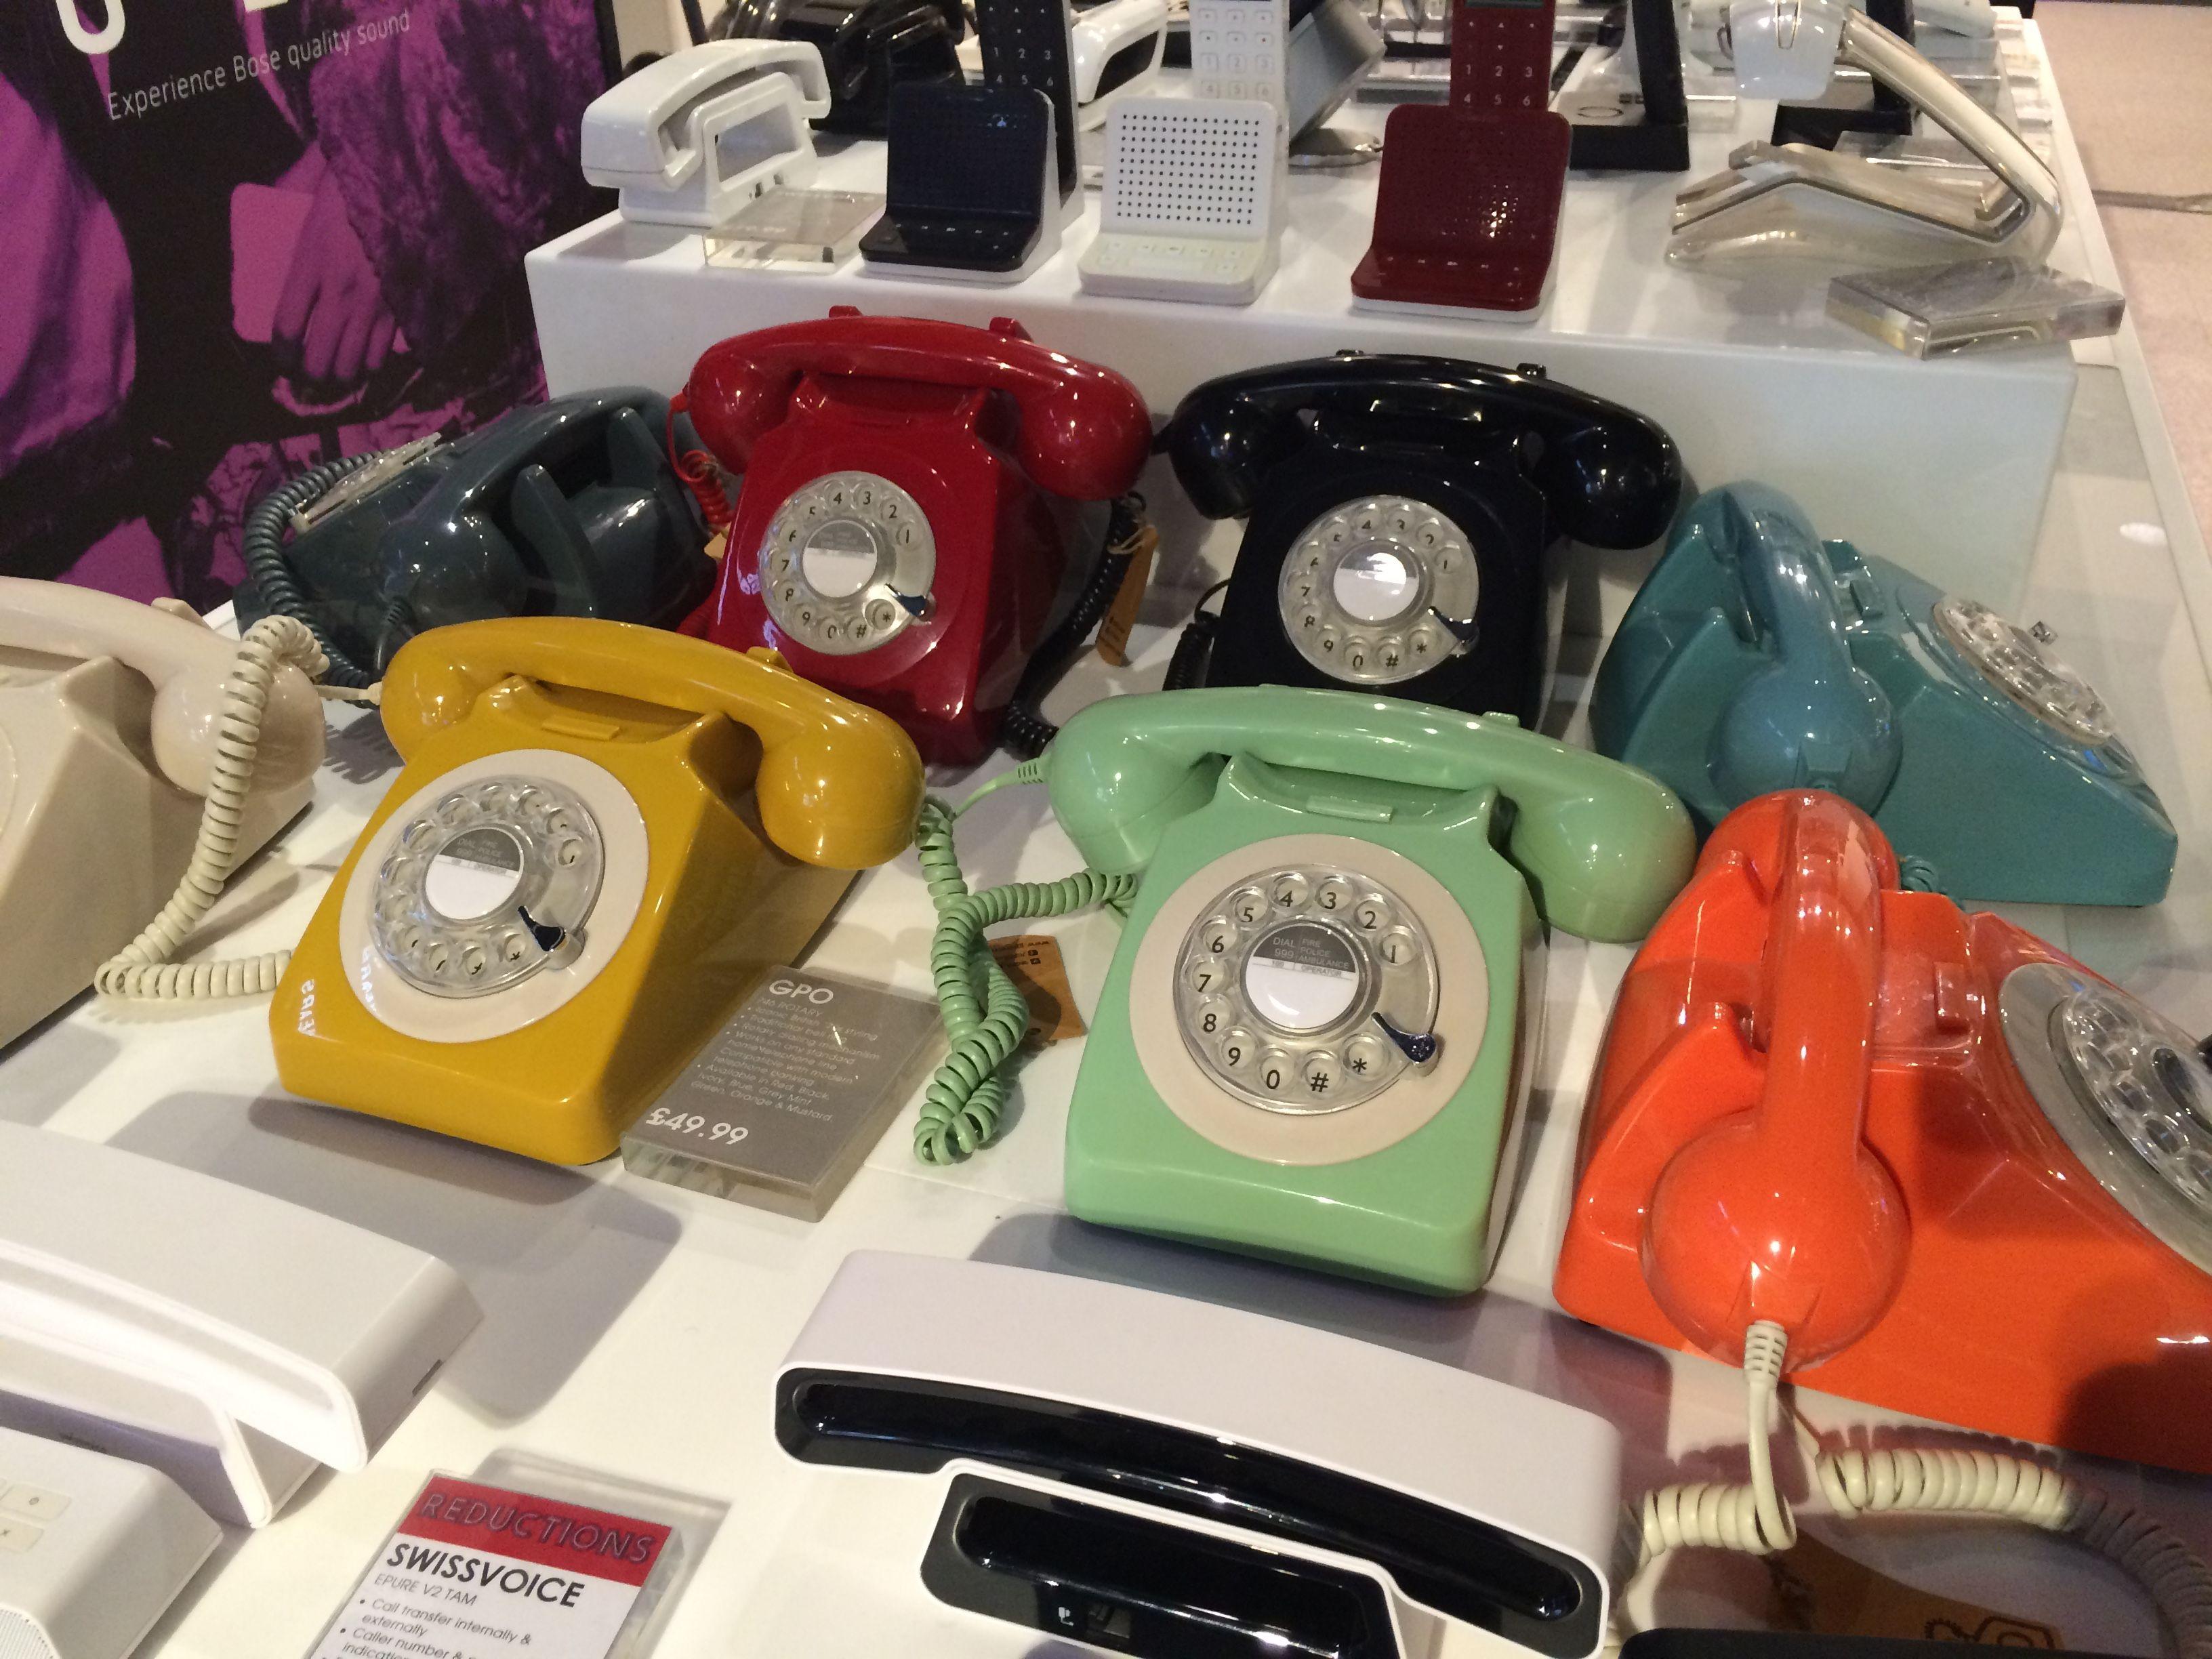 August 17, 2016 #Selfridges&Co #London #phones